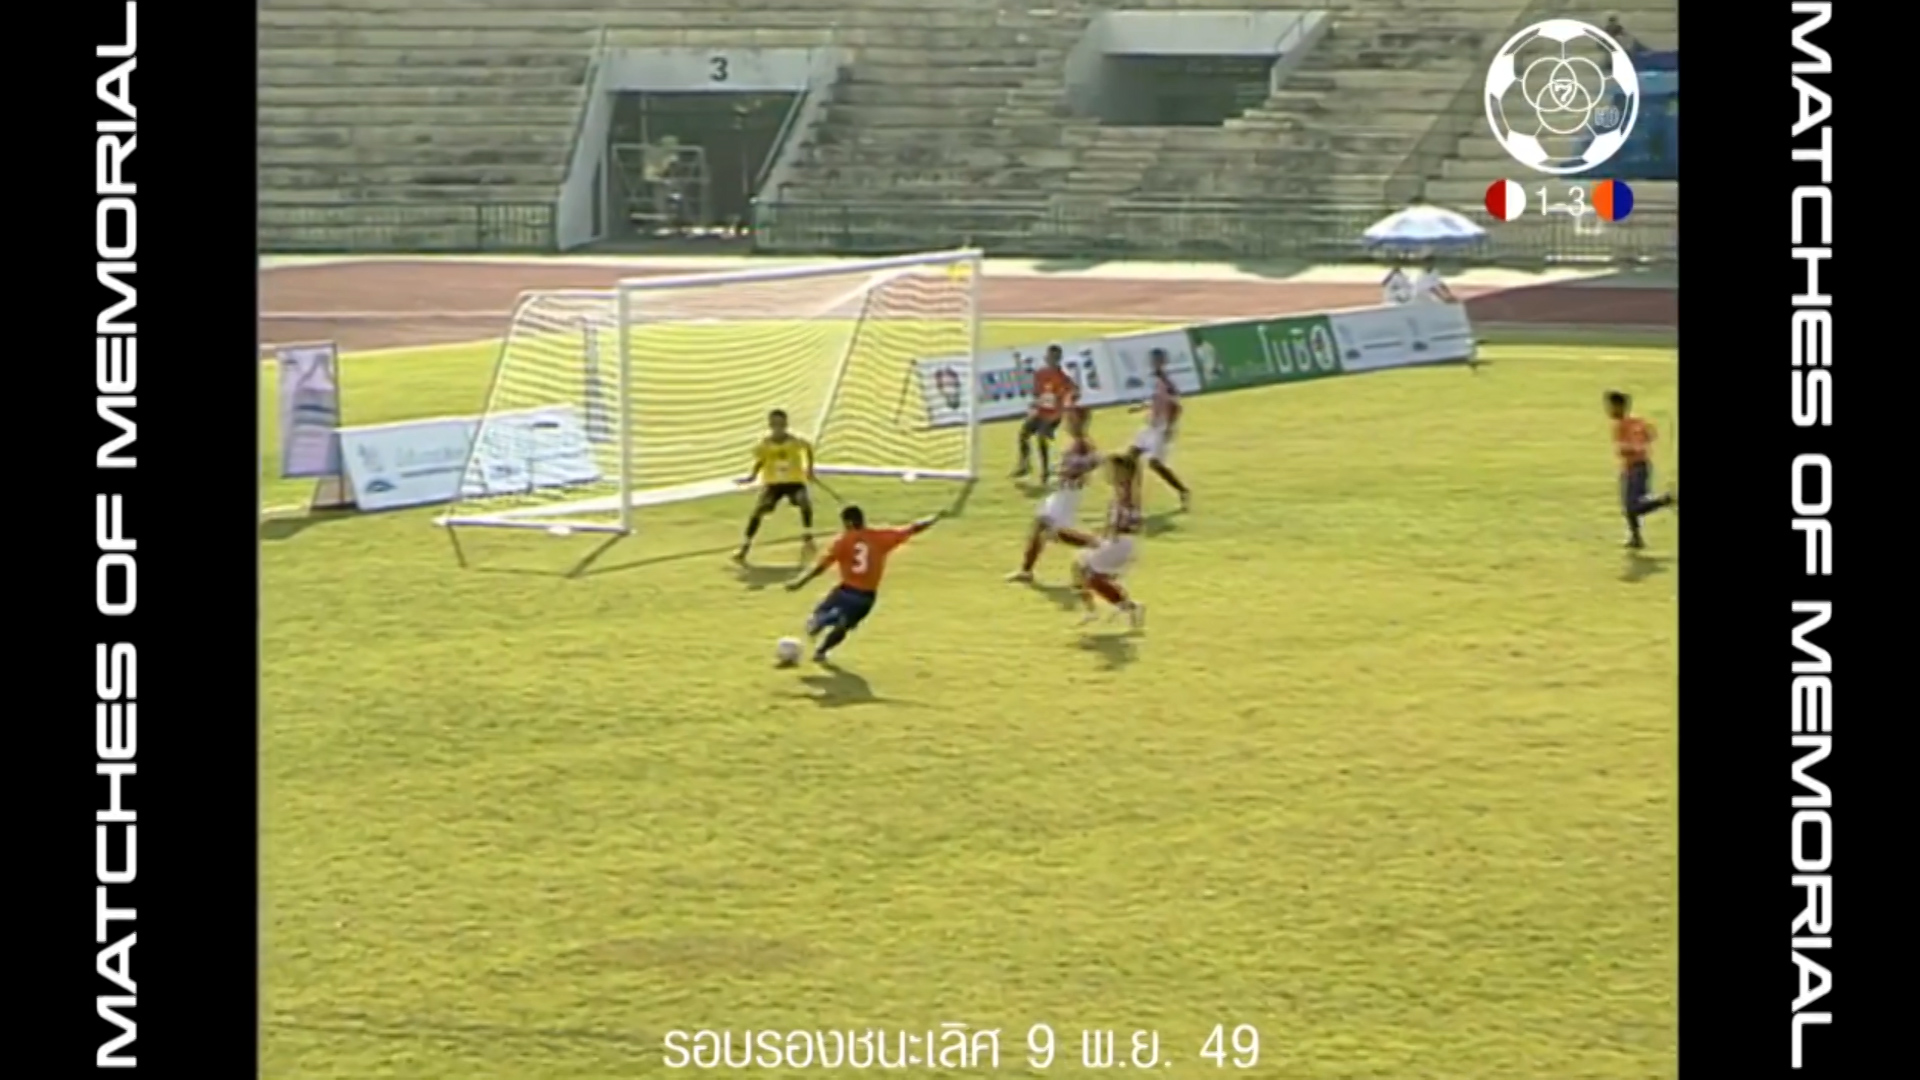 Matches of Memorial : EP.17 แมตช์แห่งความทรงจำ ฟุตบอลนักเรียน 7 คน ที่สนุกที่สุด